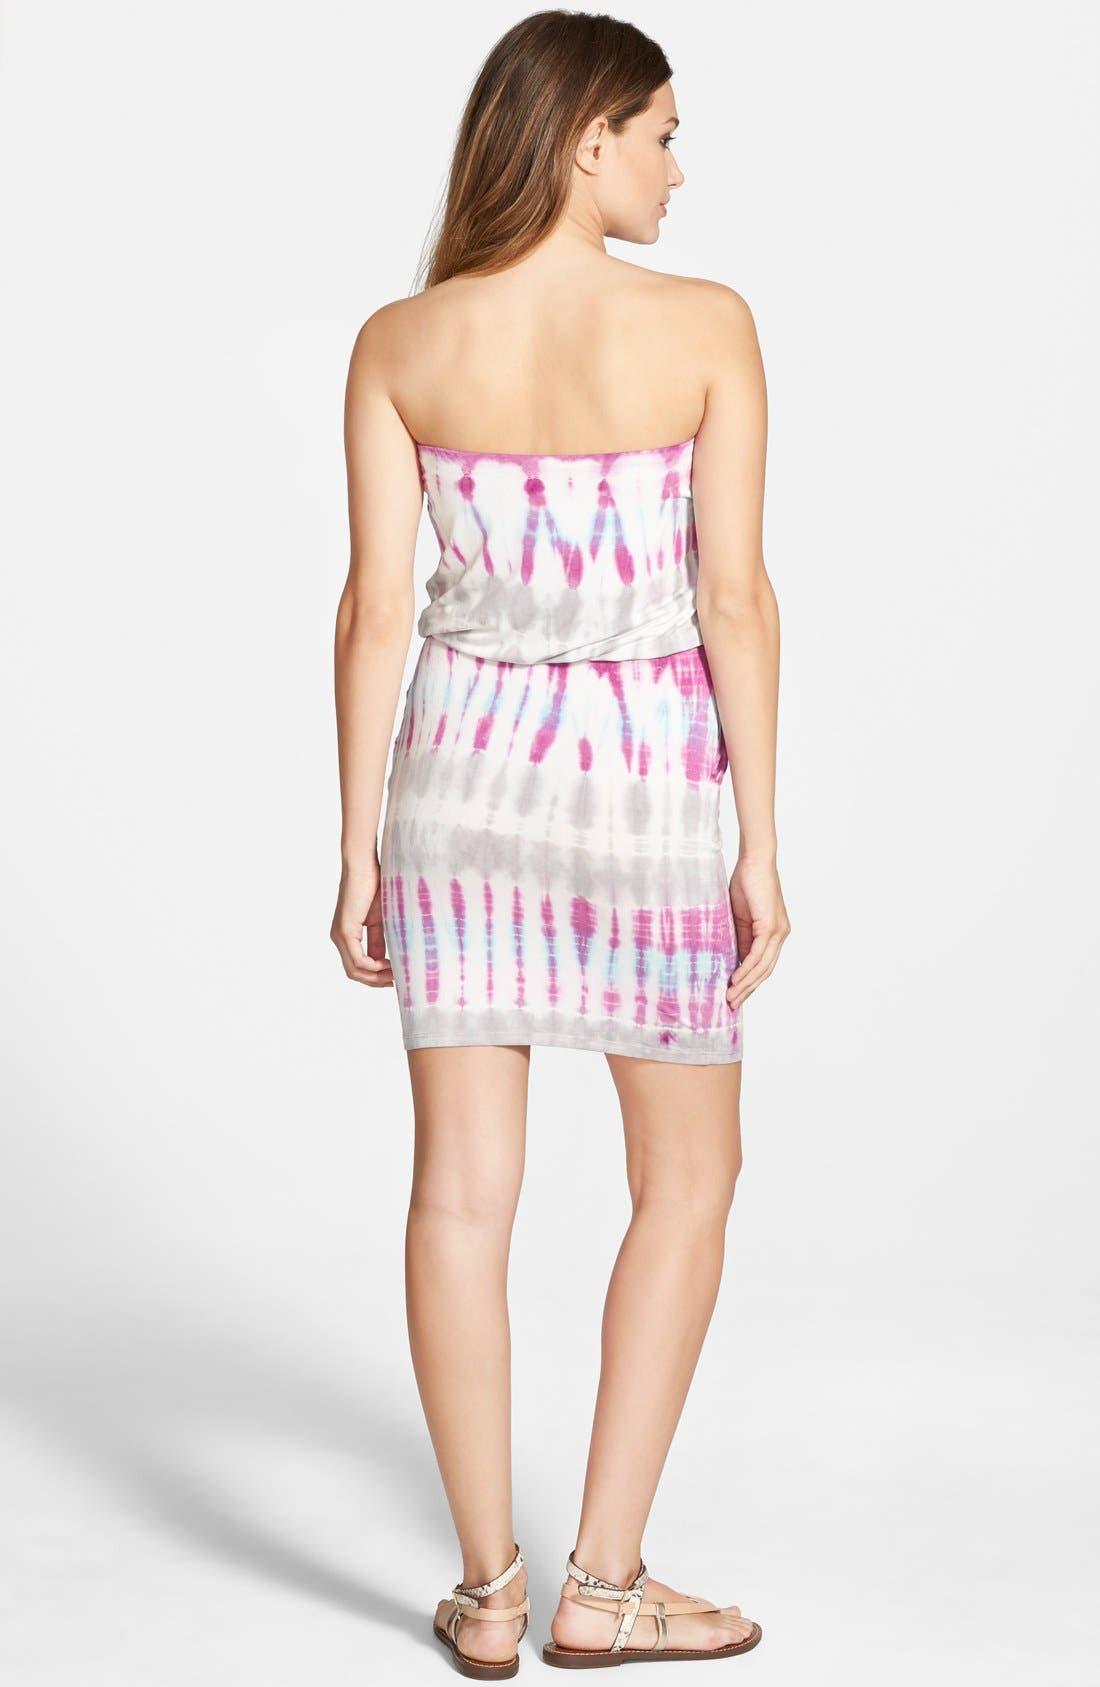 Alternate Image 2  - Young, Fabulous & Broke 'Freya' Strapless Tie Dye Dress